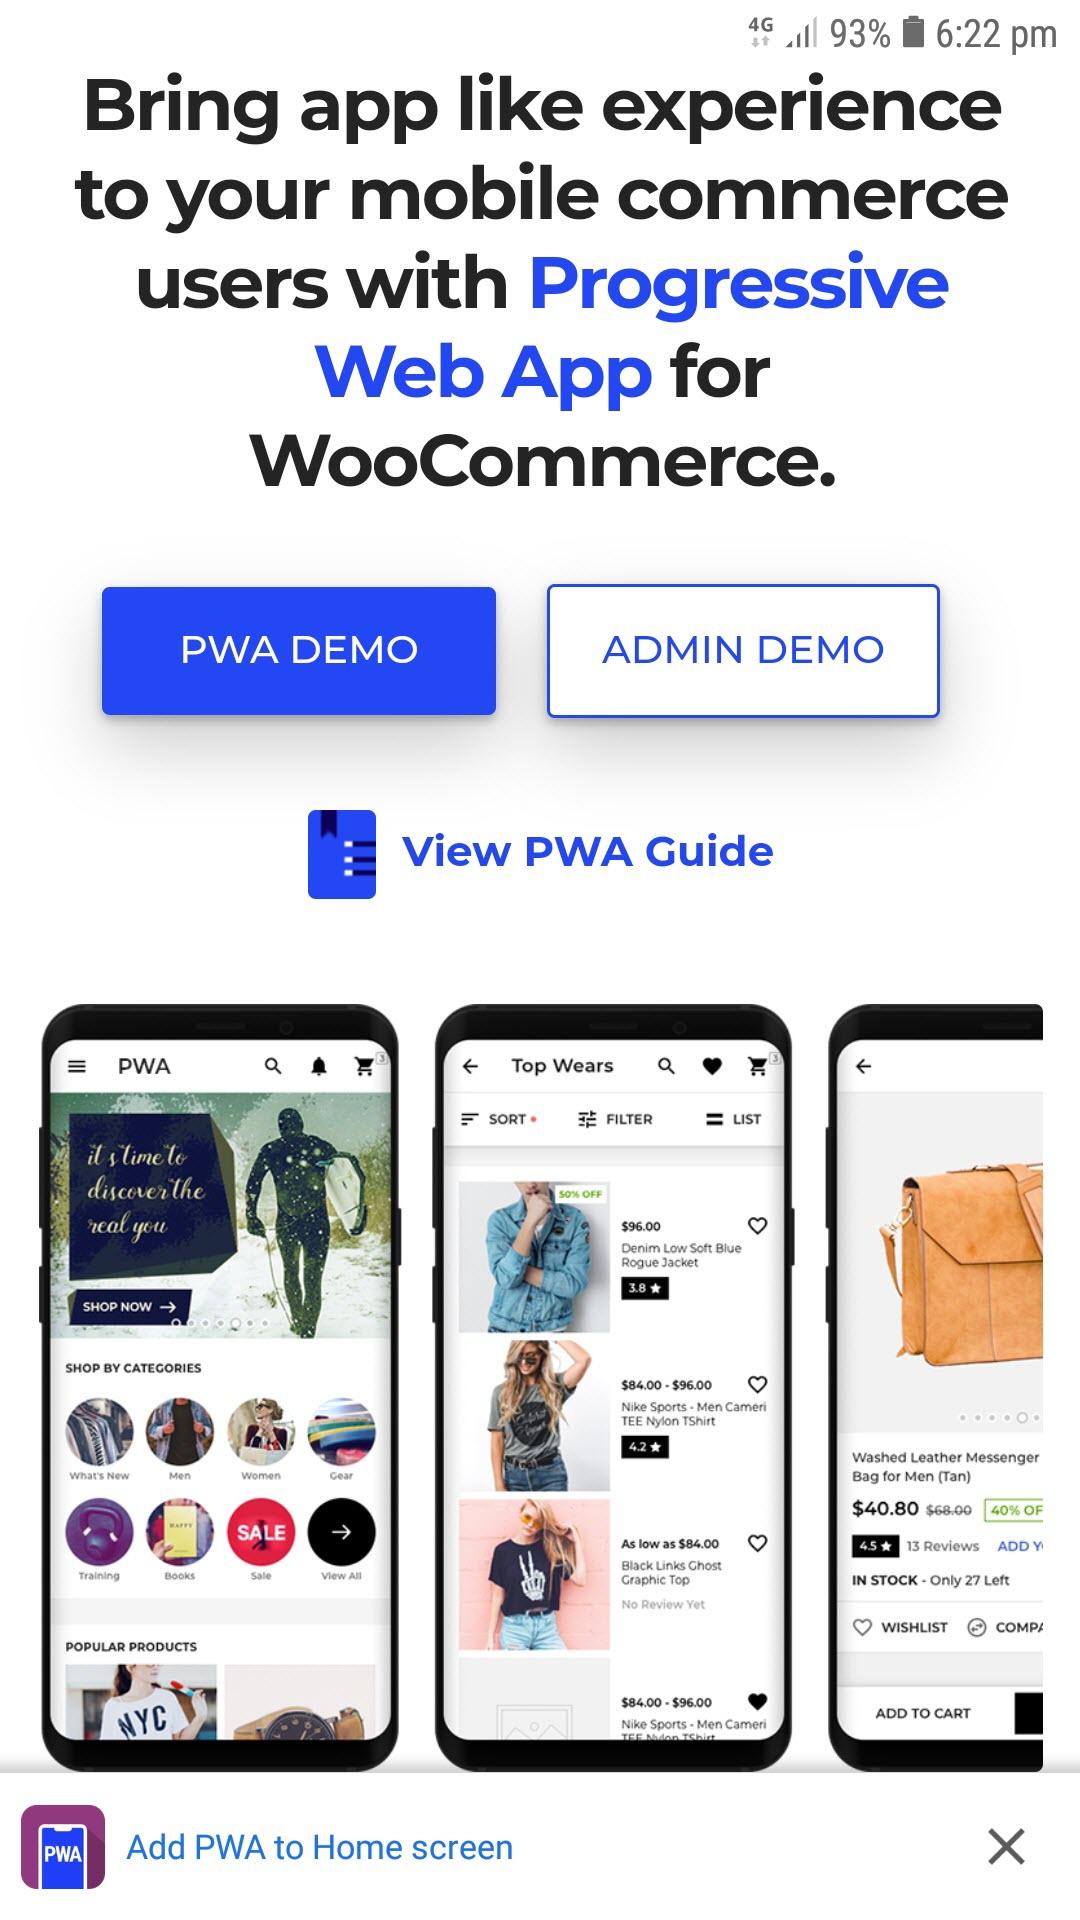 progressive web app for woocommerce add_pwa_to_home_screen